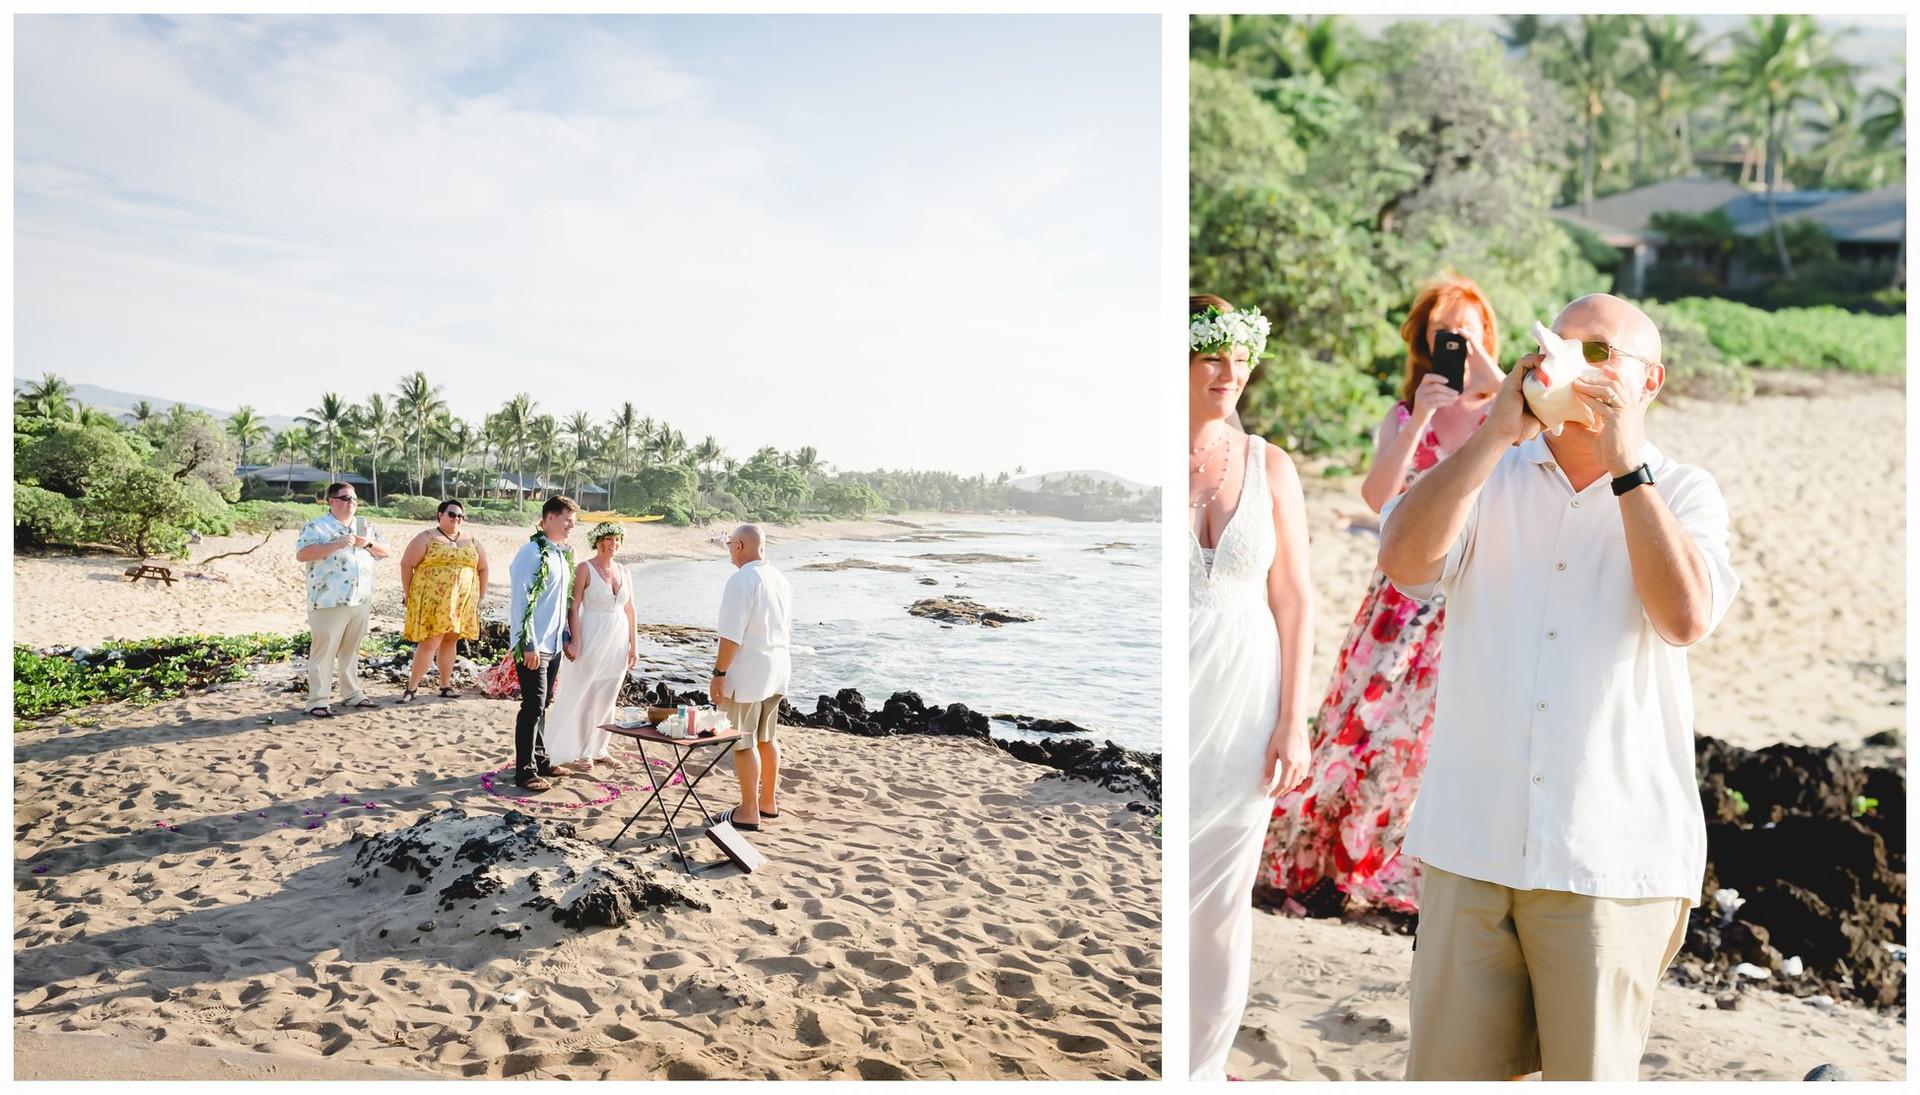 Hawaii Beach Weddings-10.jpg